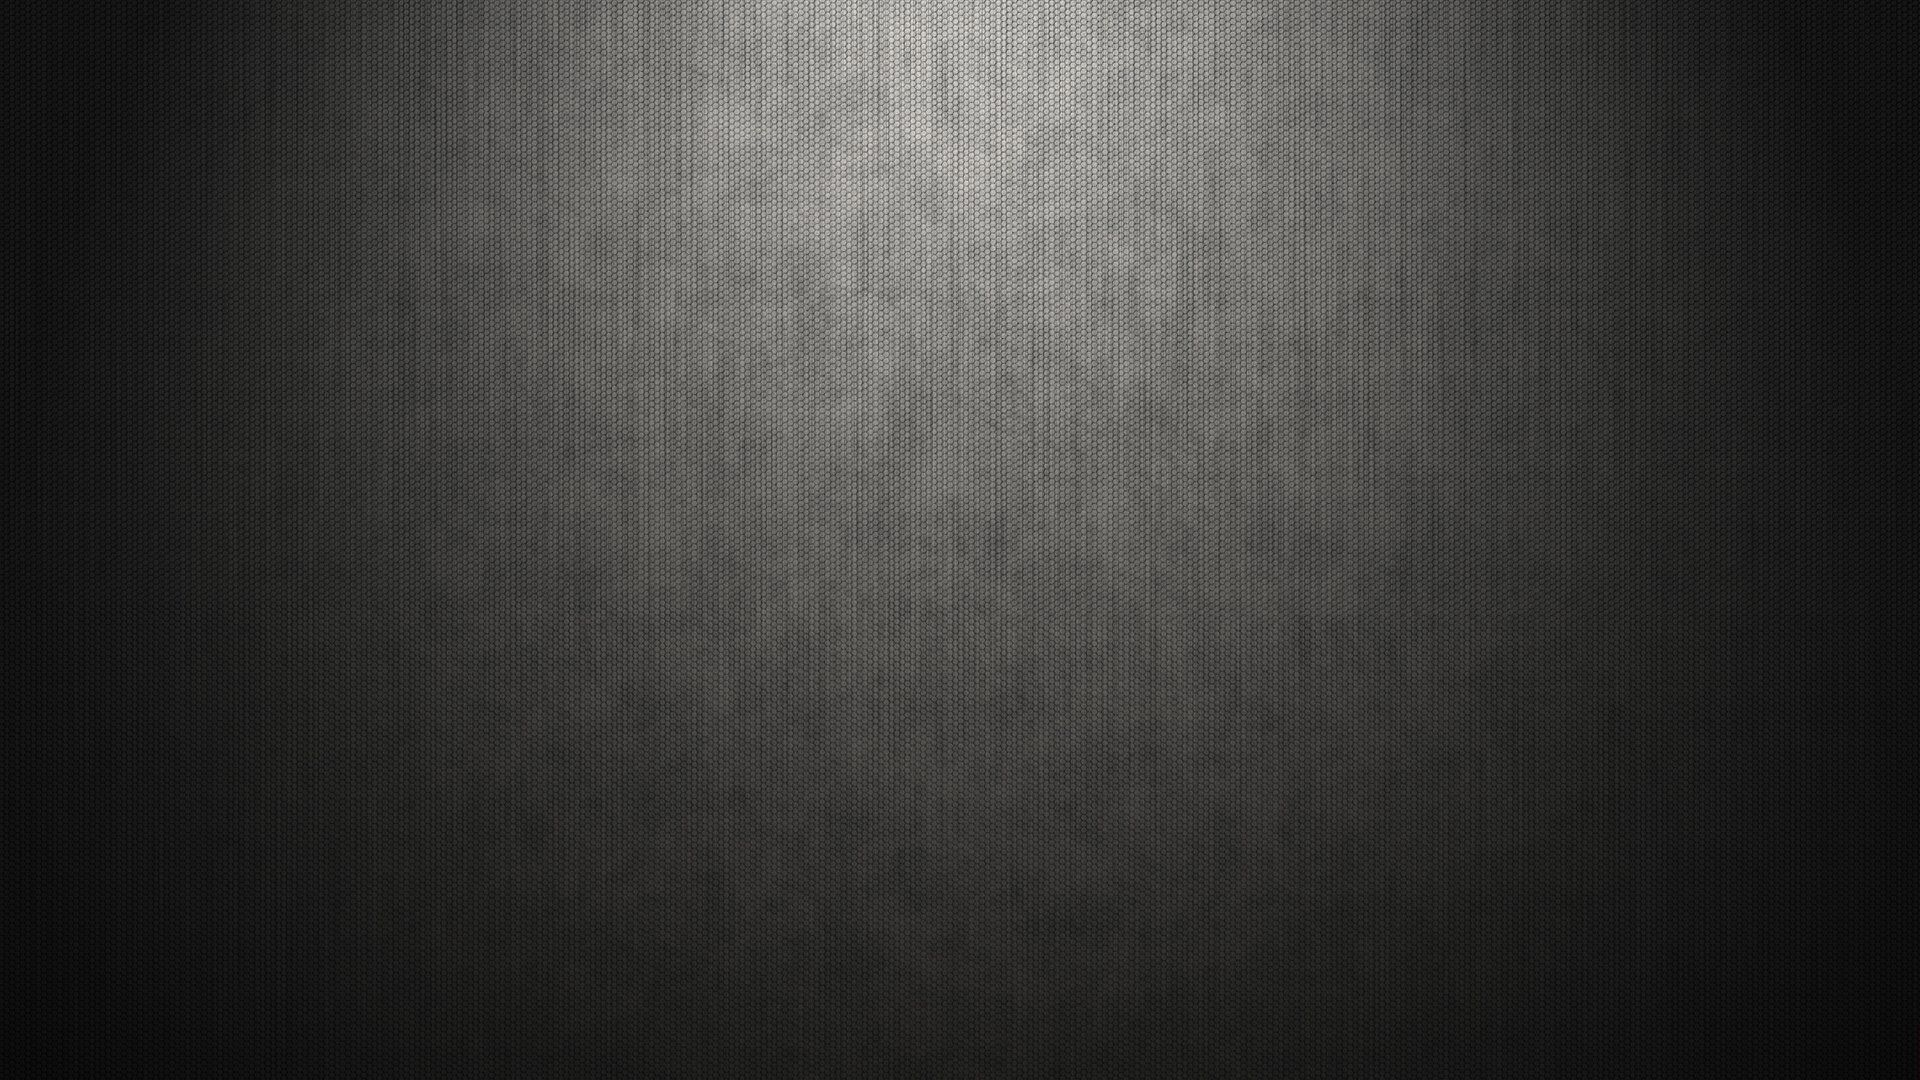 40+ The Best Grey Background Wallpaper Designs